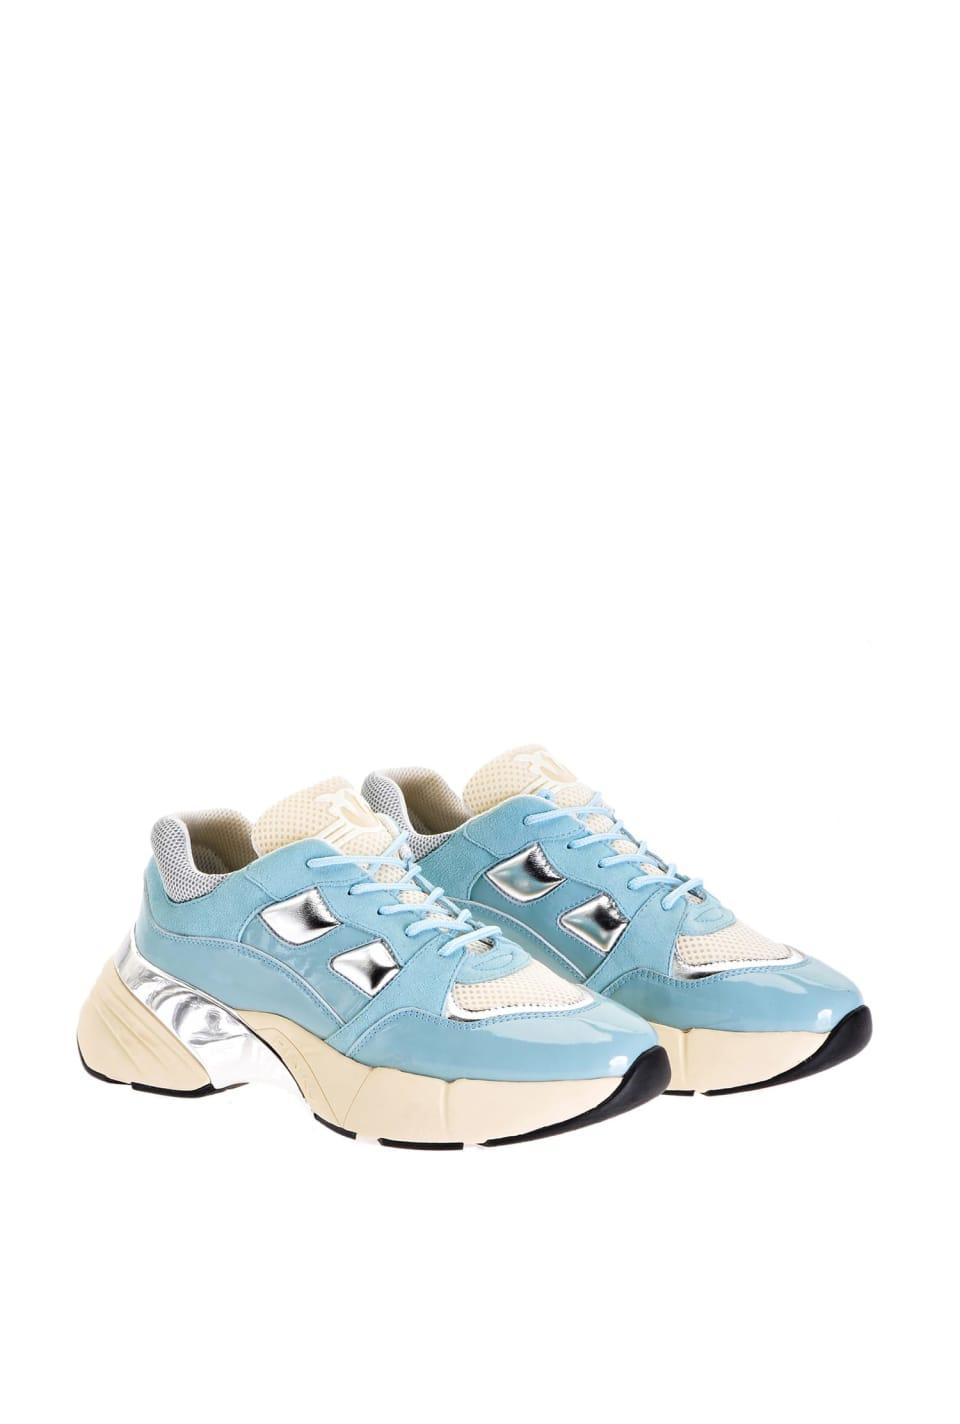 Zapatos deportivos Shoes to Rock Sky